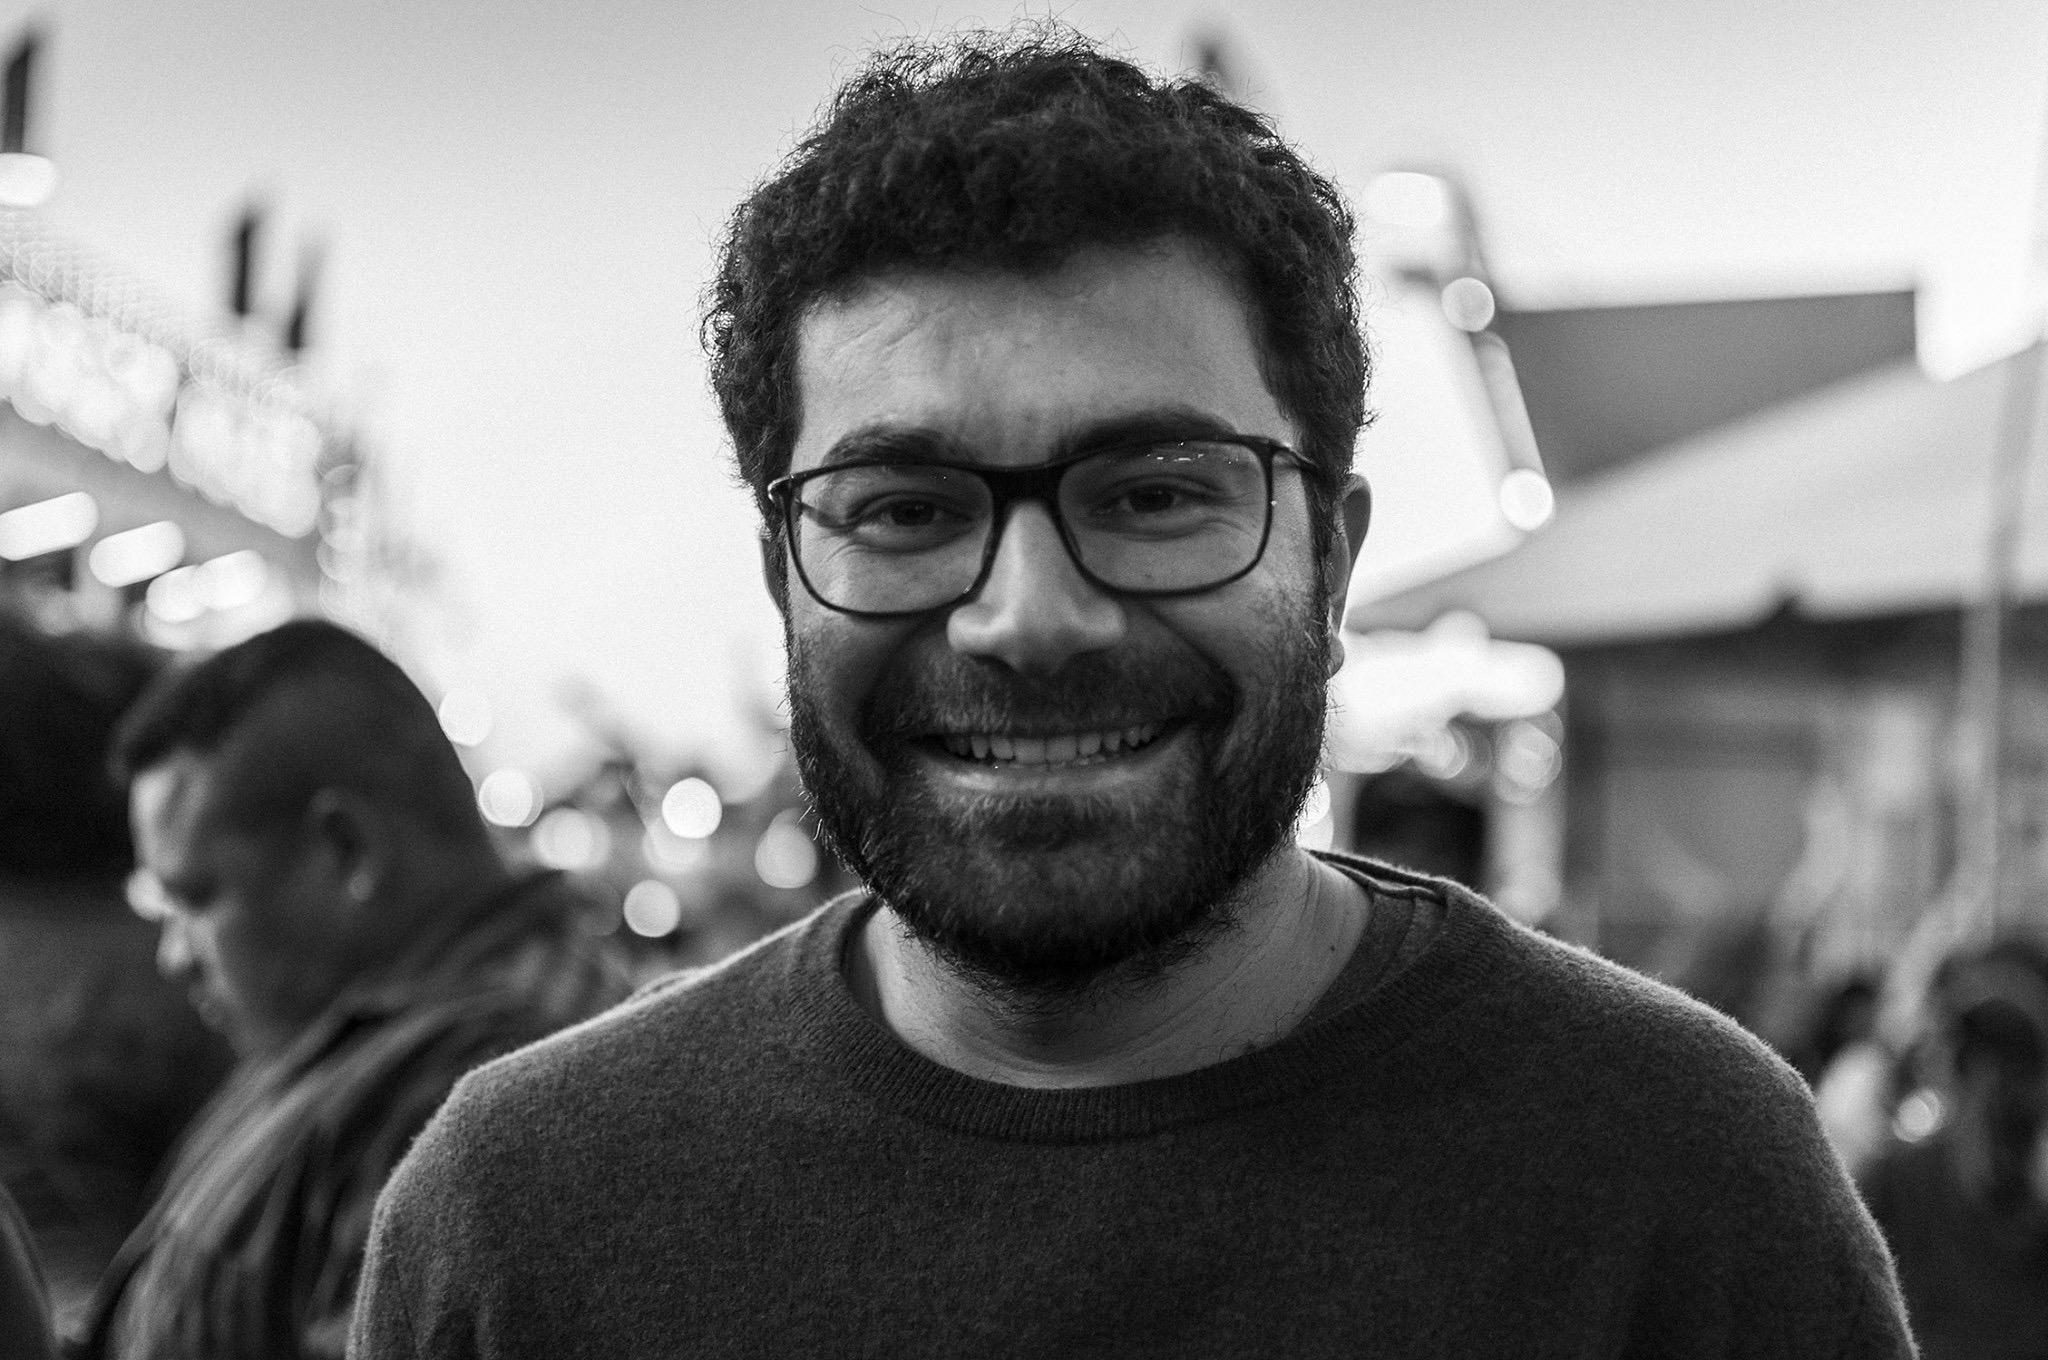 Fatih Serkant Adiguzel